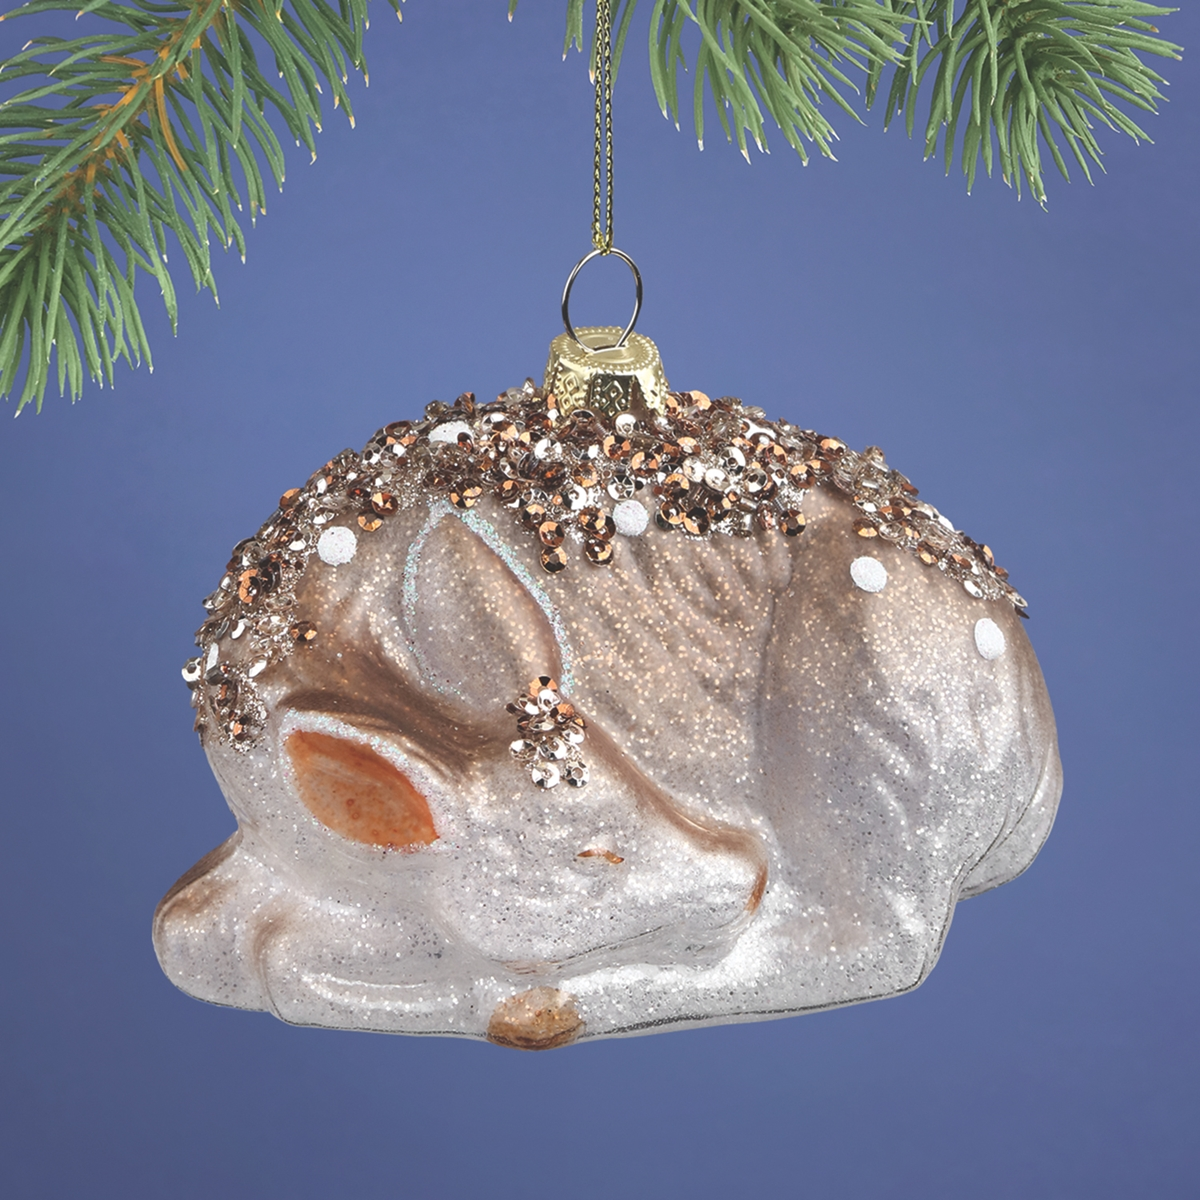 Sleeping Deer Glass Ornament